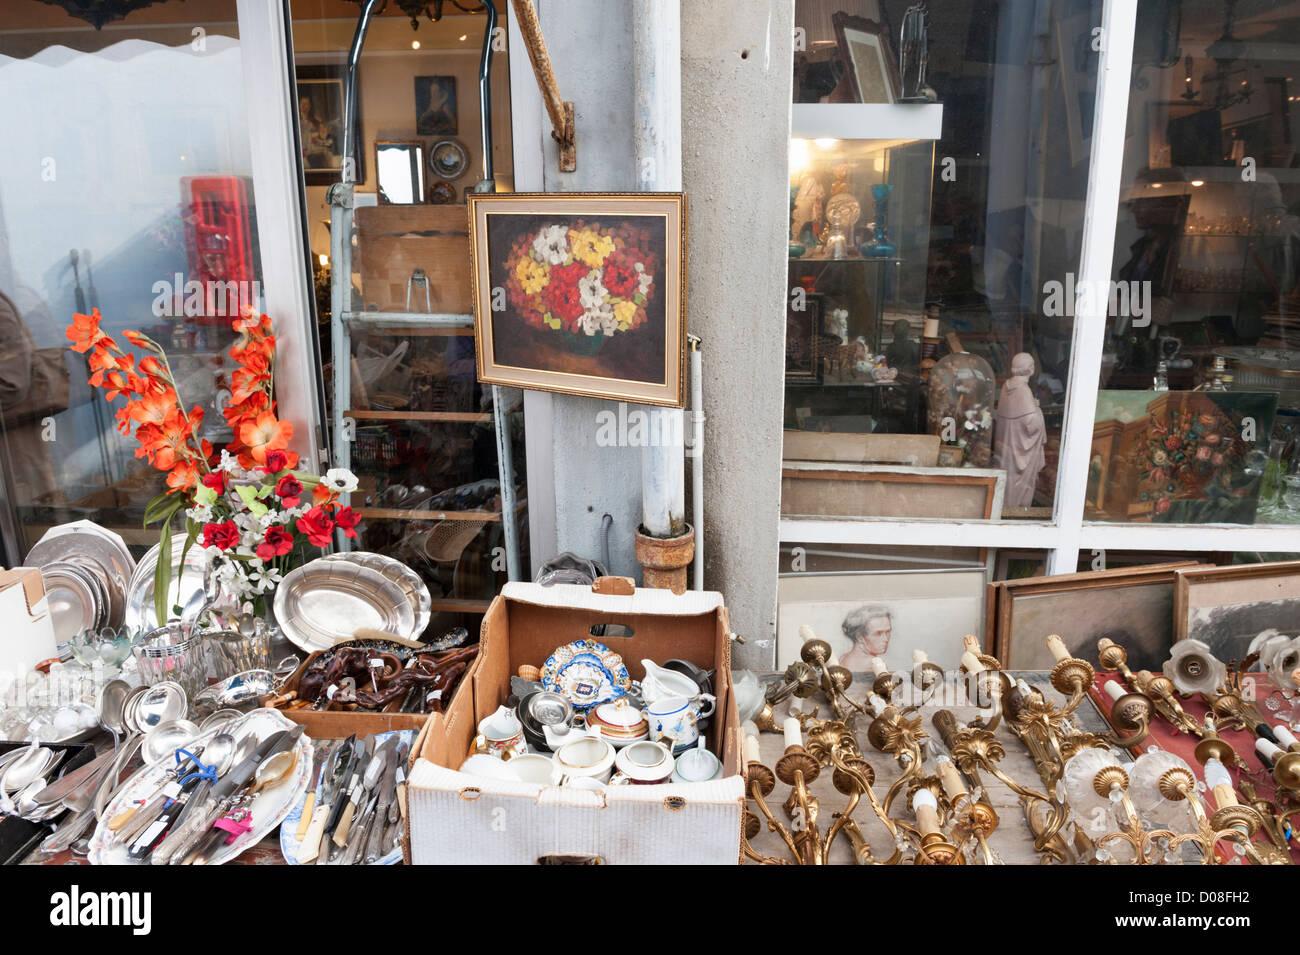 paris flea market clignancourt stock photos paris flea. Black Bedroom Furniture Sets. Home Design Ideas